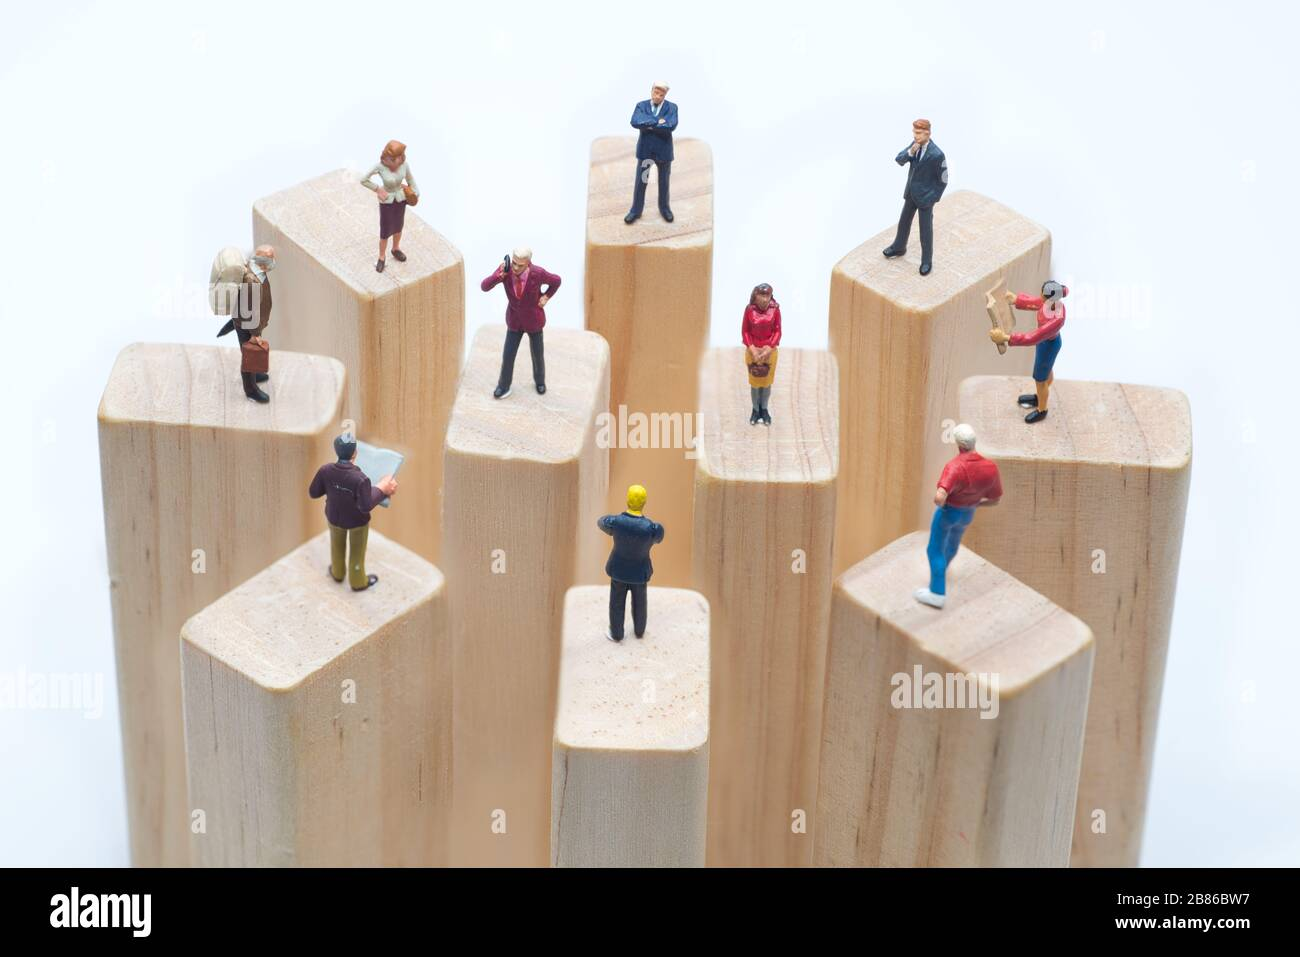 Juguetes en miniatura de pie sobre bloque de madera - concepto de distanciamiento social, antisocial o de trabajo en equipo. Foto de stock